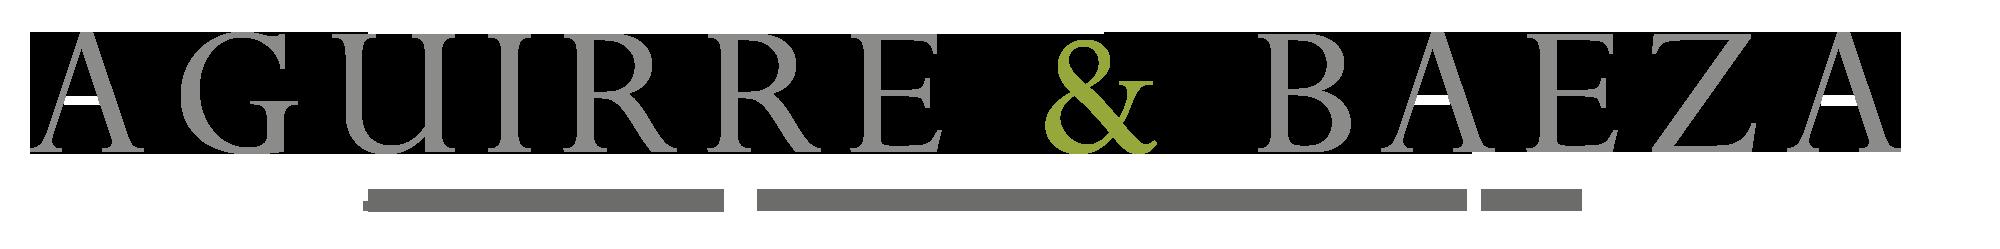 Aguirre Baeza logo